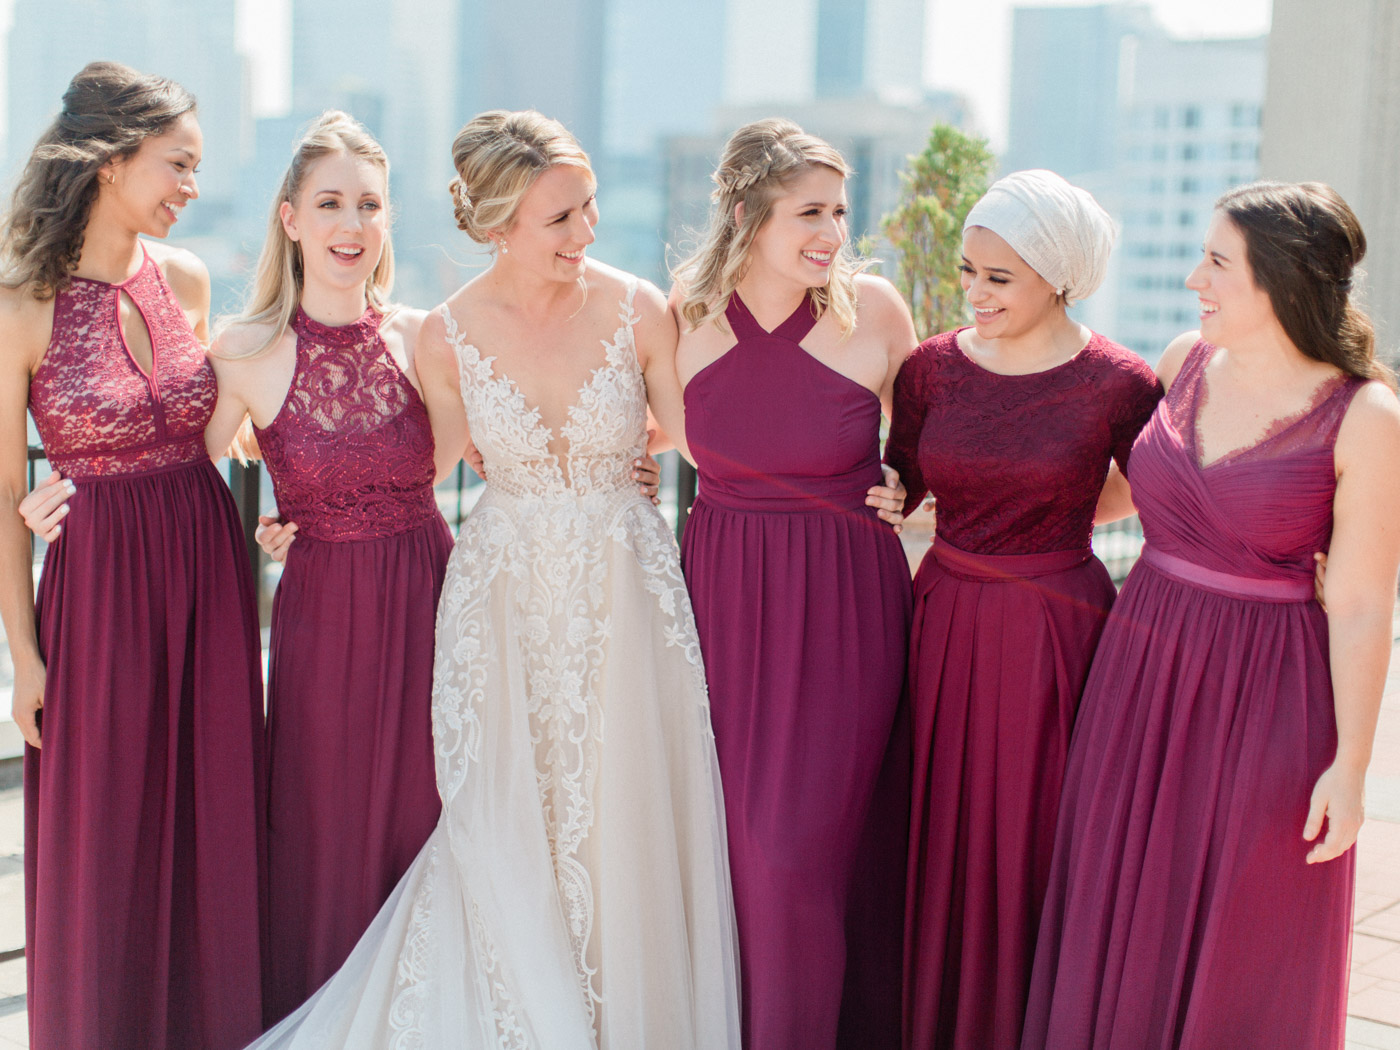 downtown-toronto-wedding-photographer-berkley-fieldhouse-blush-183.jpg